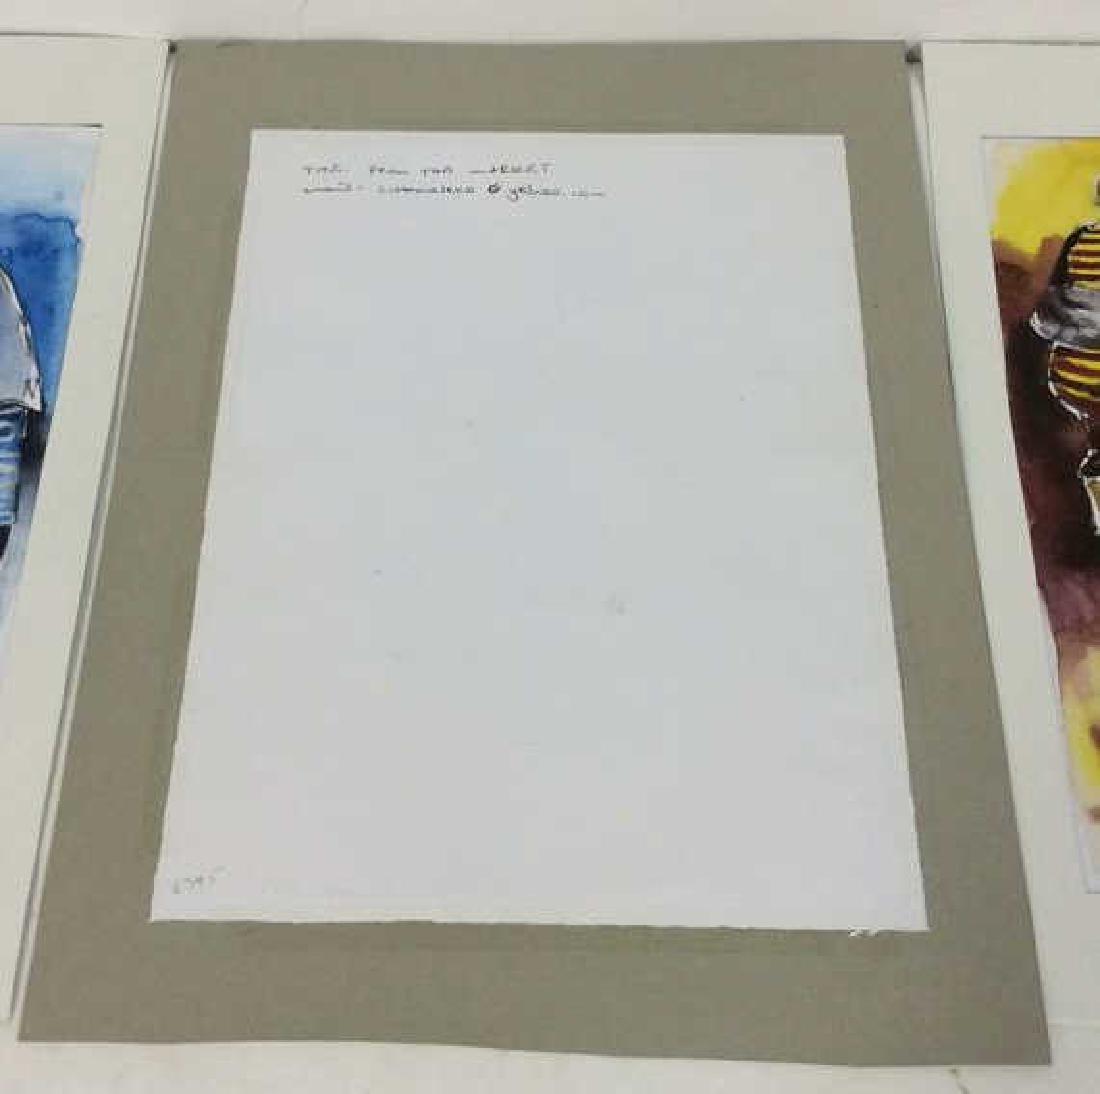 Lot 3 Signed Owen Maseko Watercolor Painting - 9